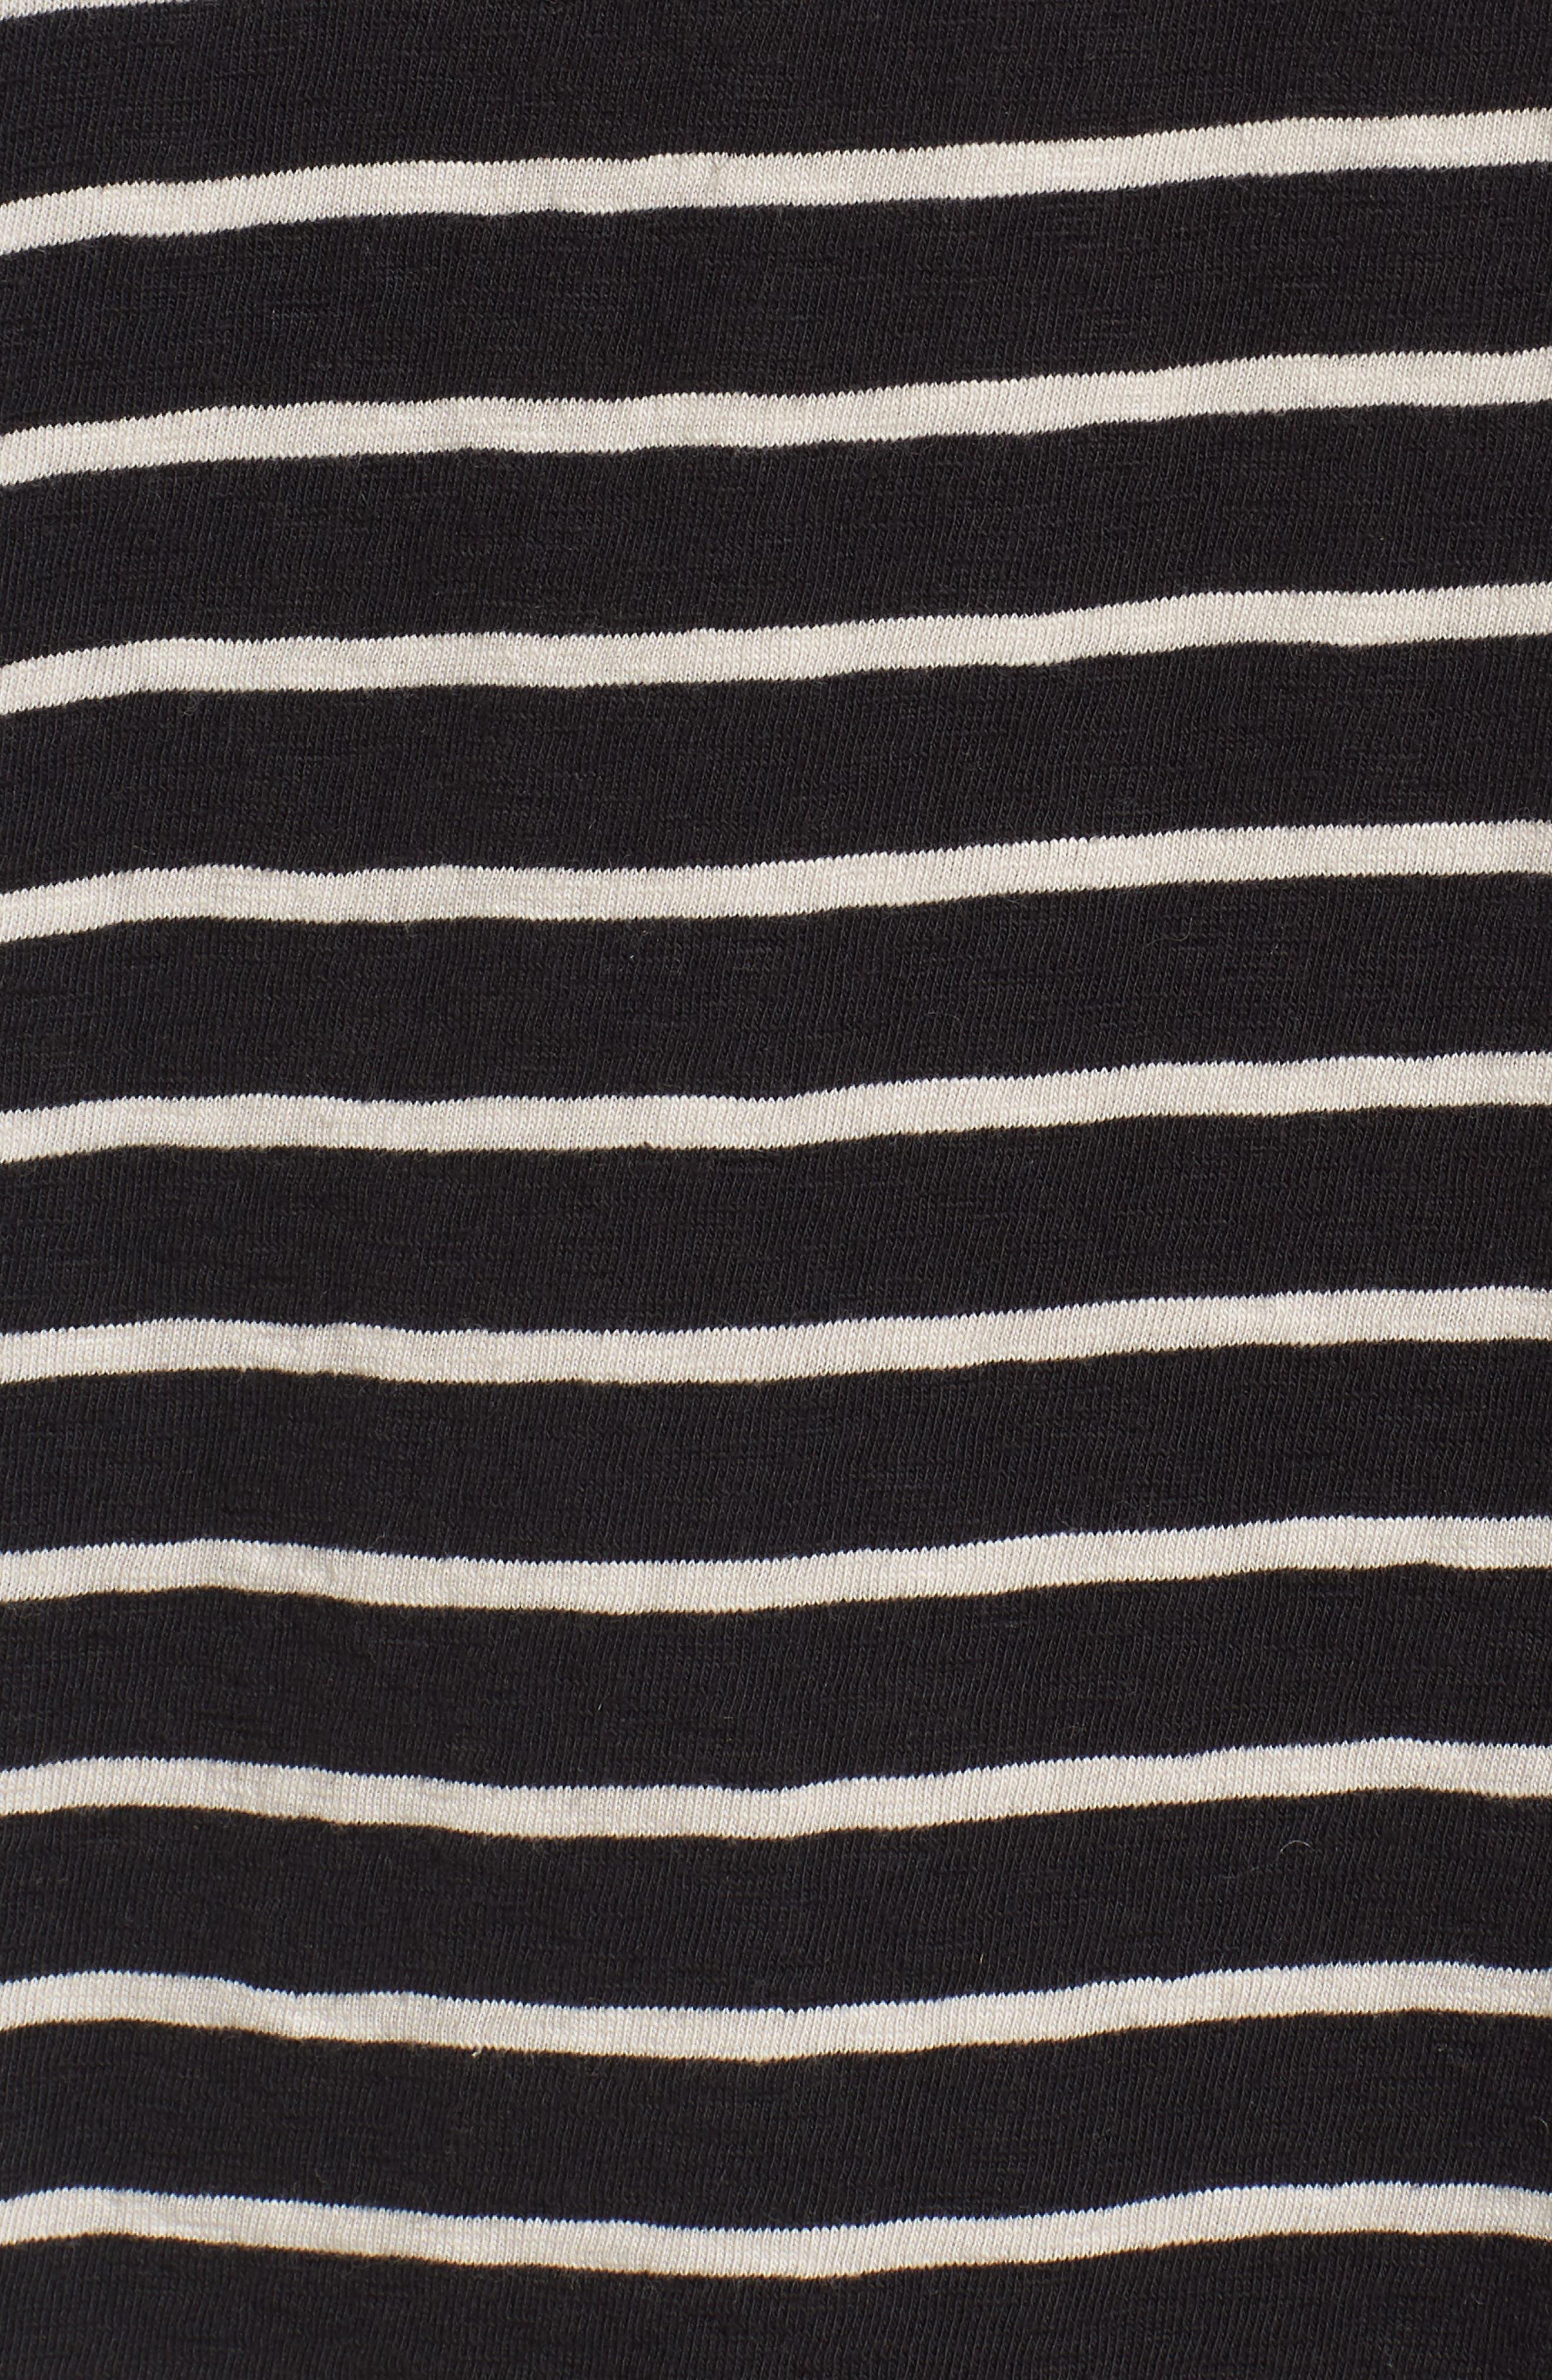 Stripe Longline T-Shirt,                             Alternate thumbnail 5, color,                             Black/ Clay